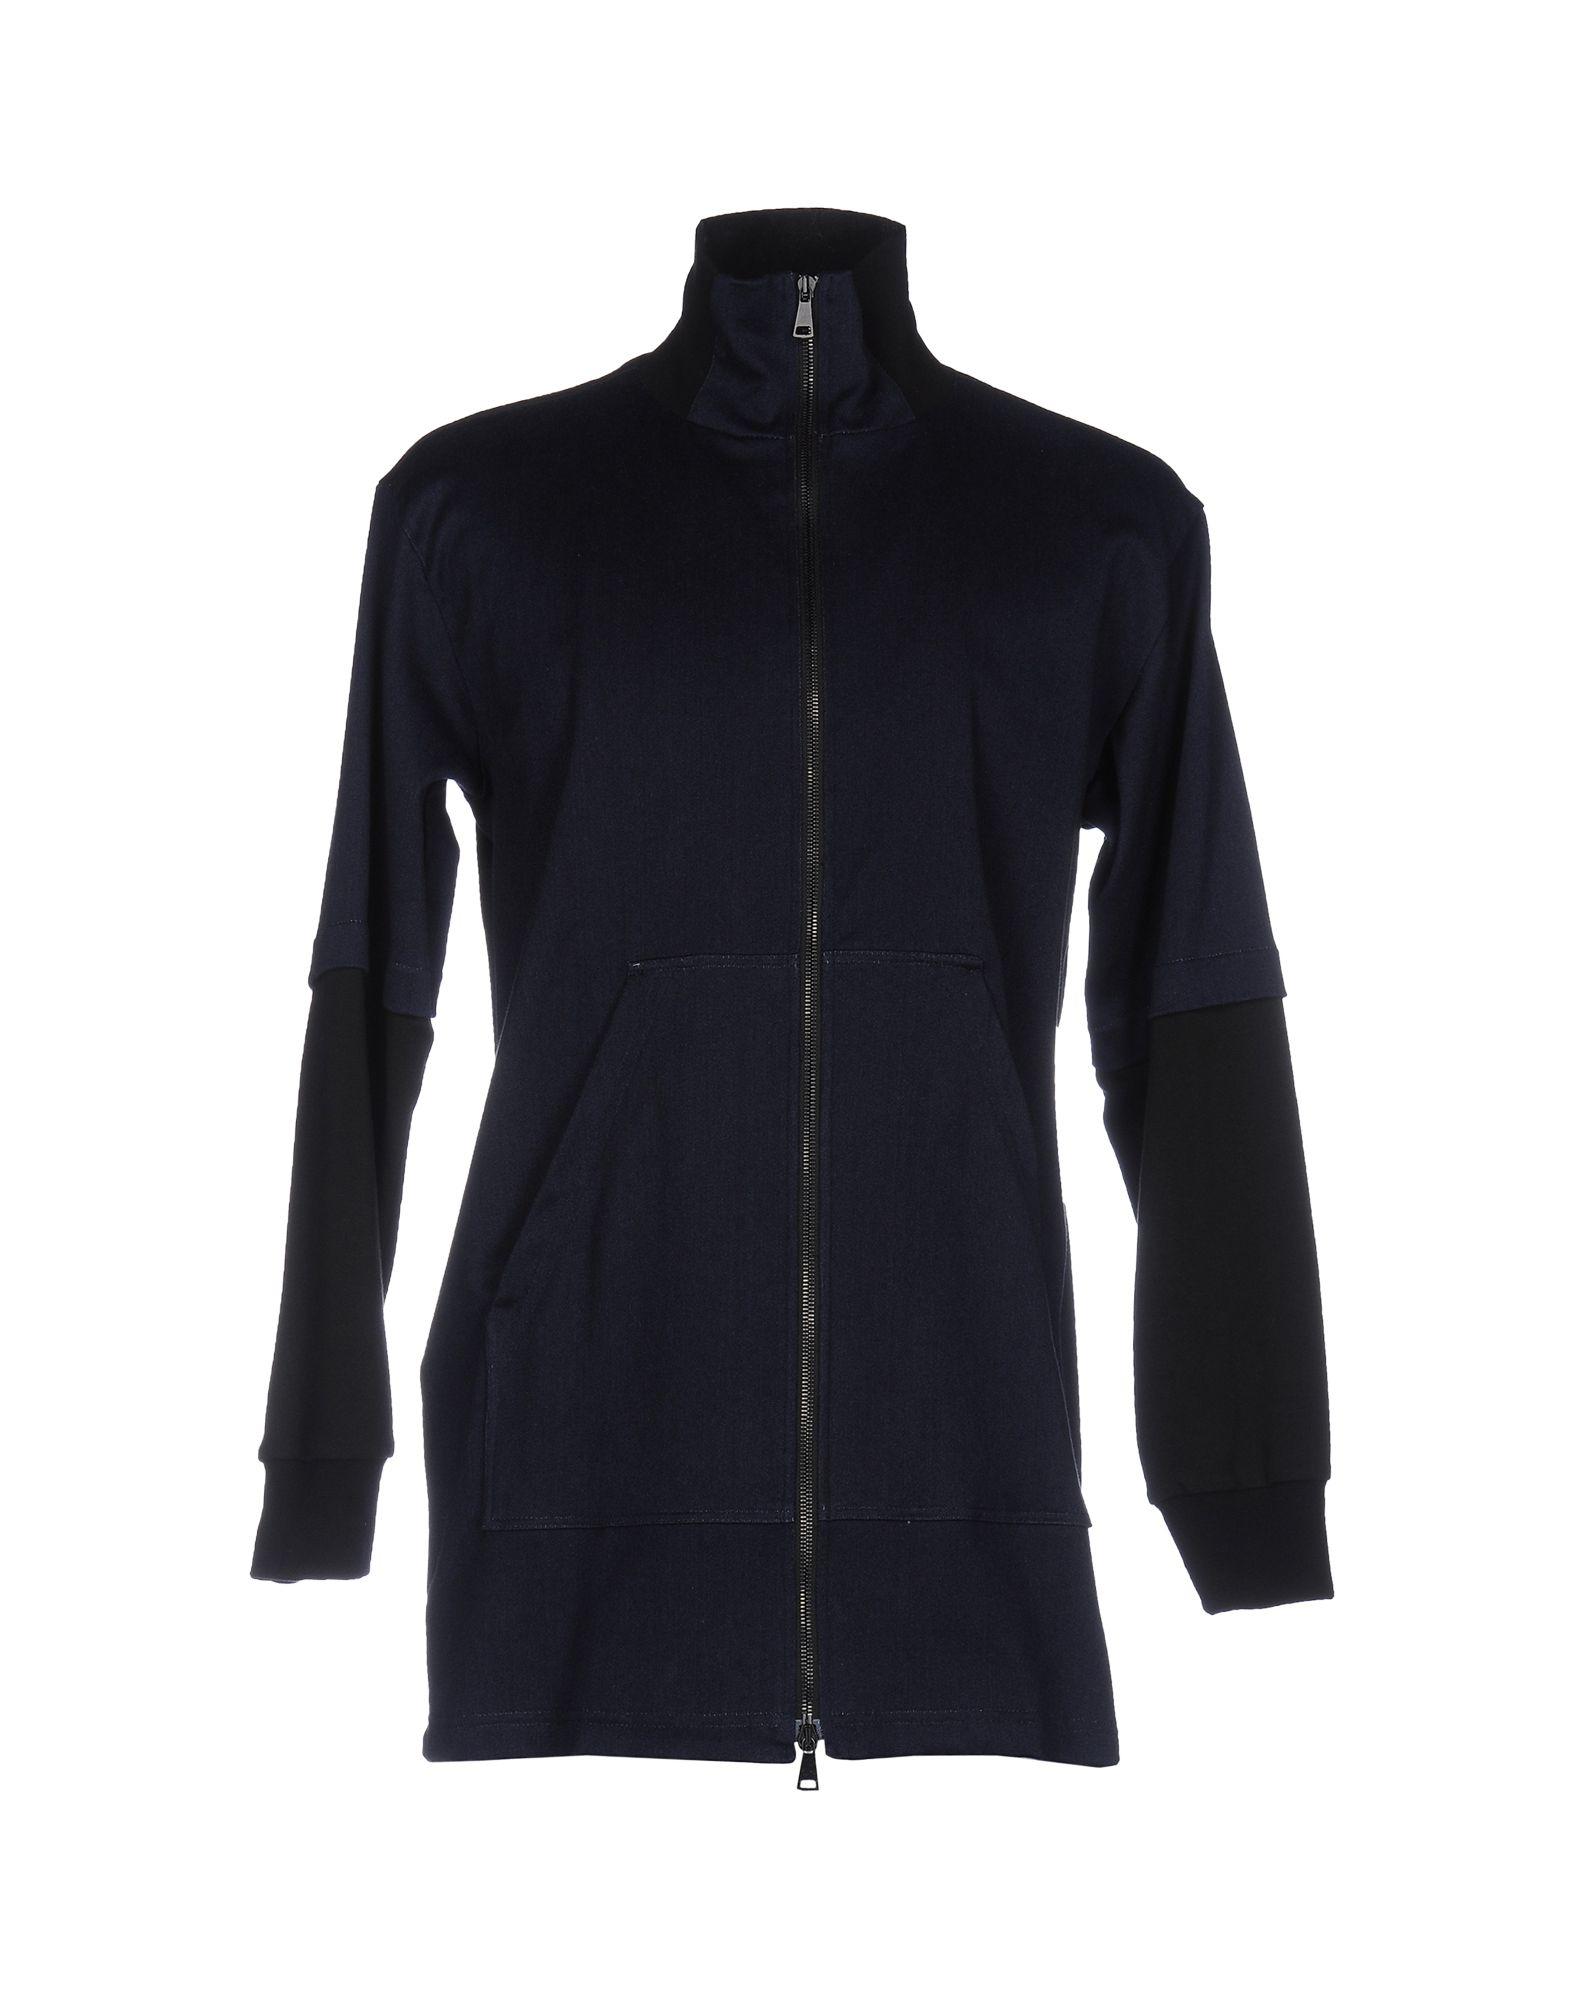 YOON Джинсовая верхняя одежда верхняя одежда